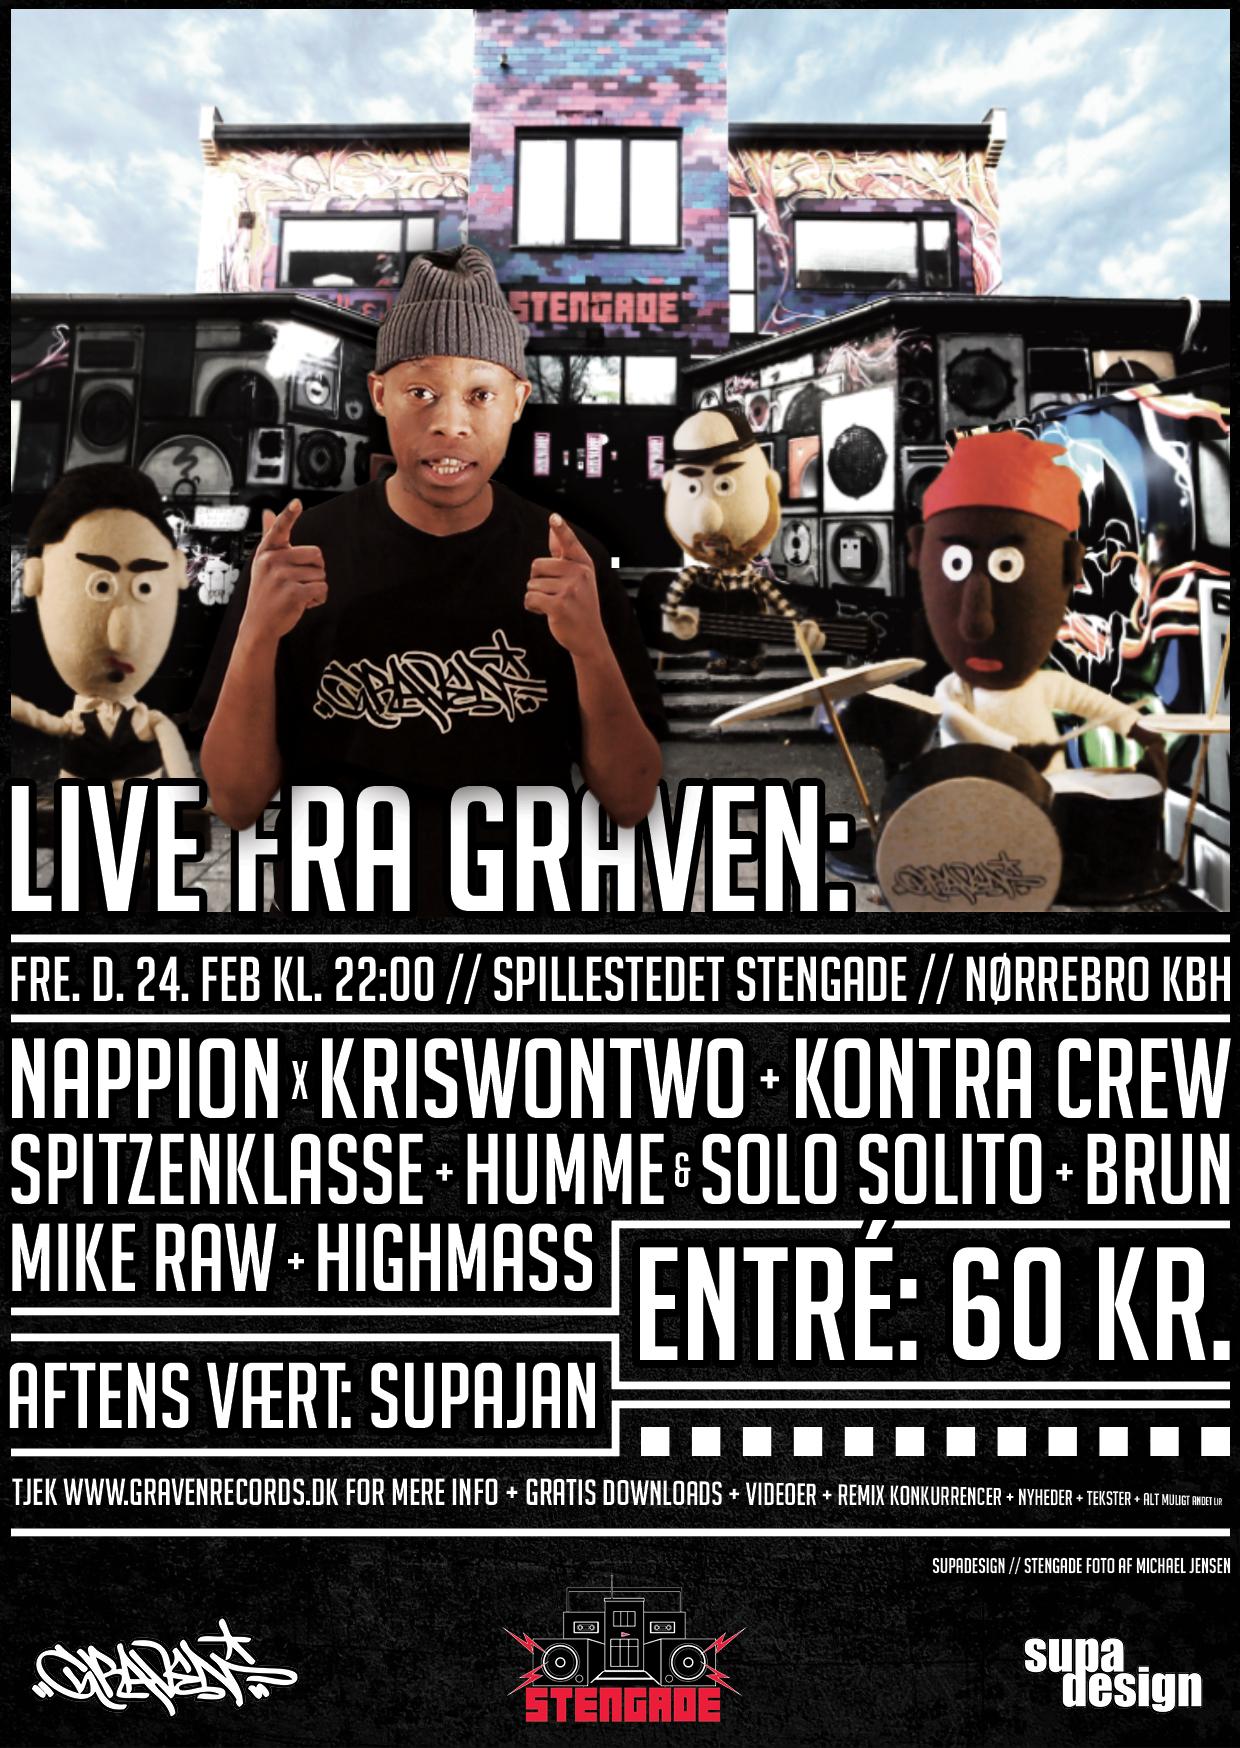 LIVE FRA GRAVEN // STENGADE